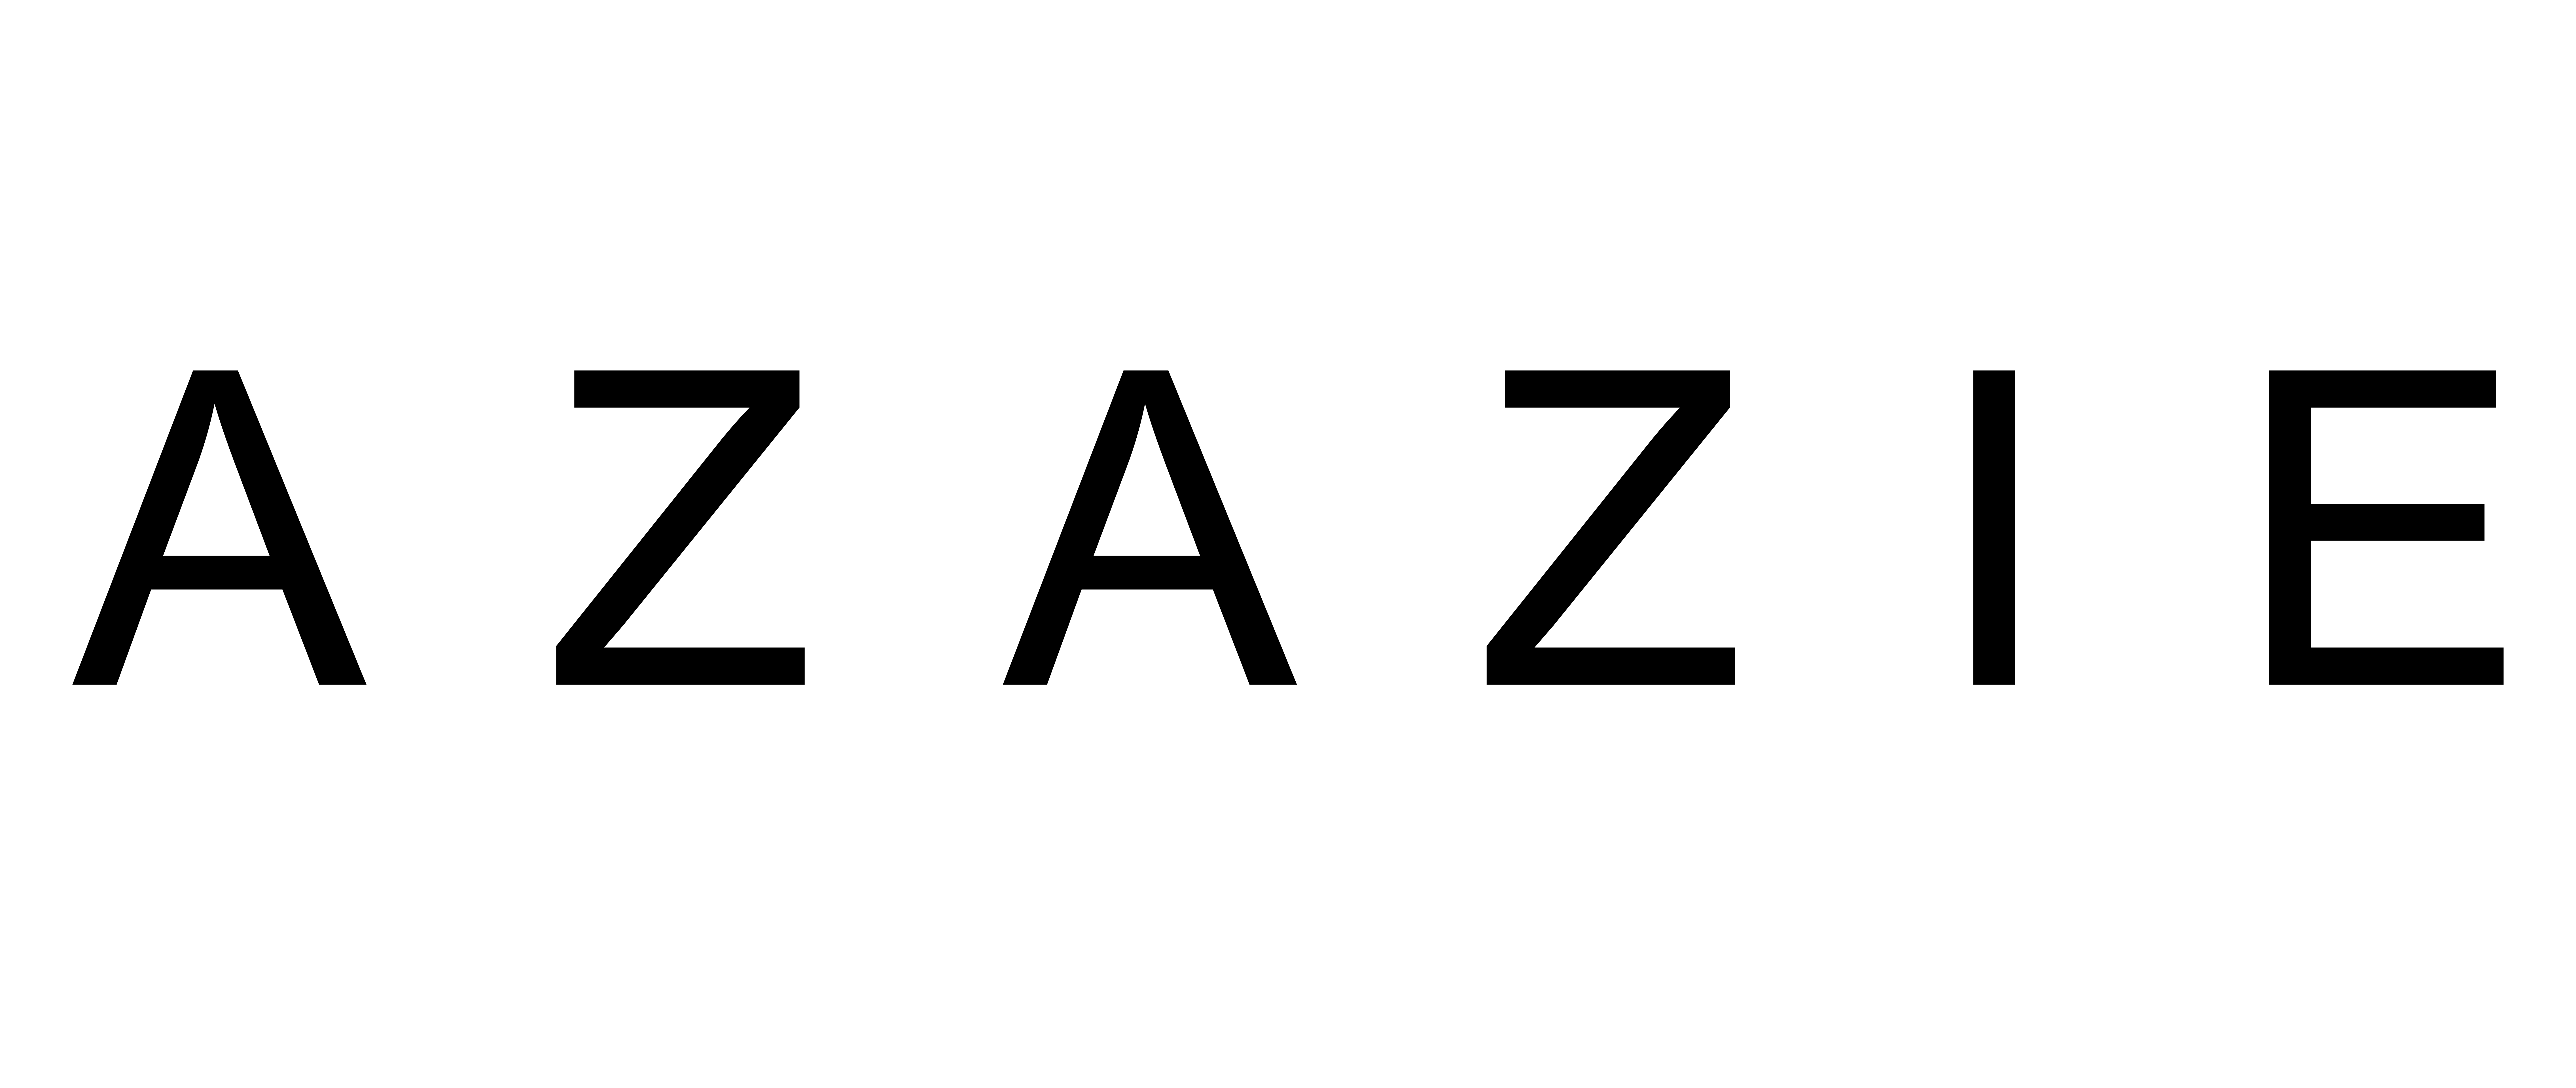 azazie-logo high resolution